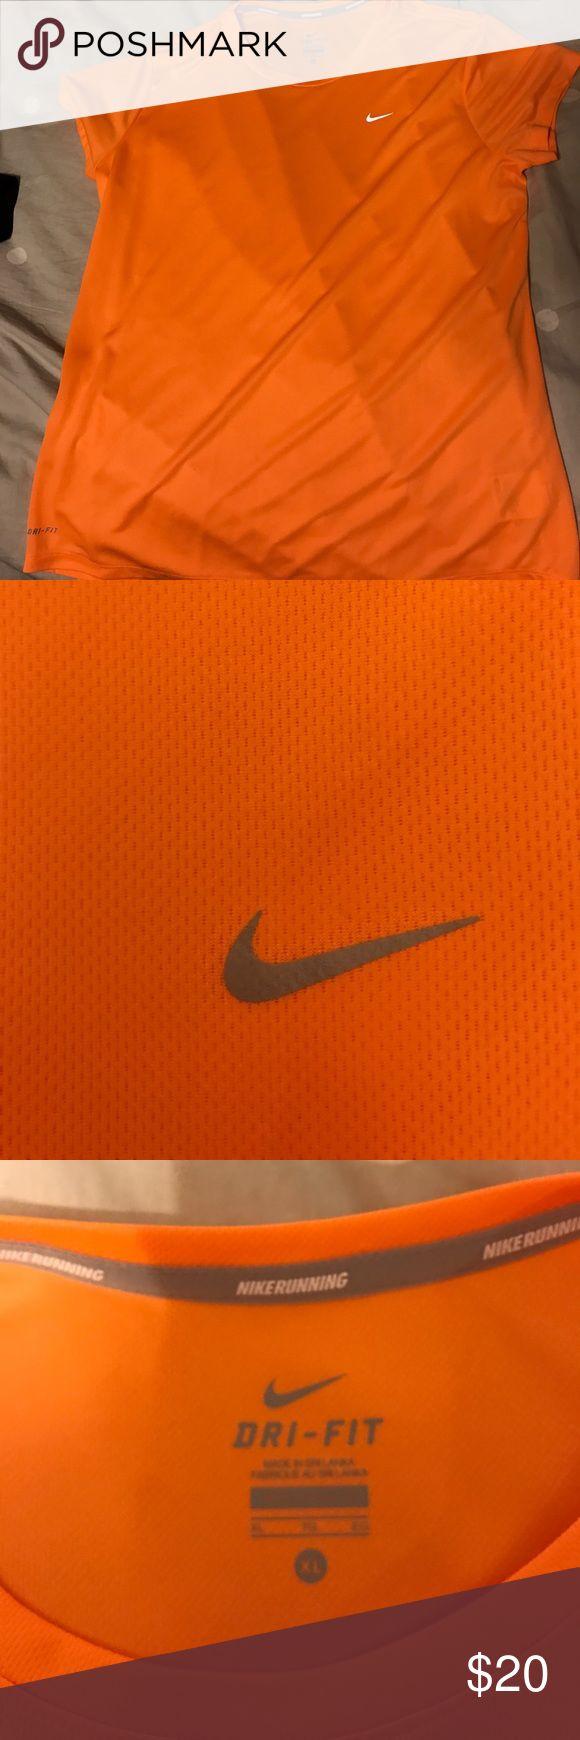 bright orange nike running dri-fit shirt! bright orange nike dri-fit running shirt, size x-large. never worn! in perfect condition. Nike Tops Tees - Short Sleeve